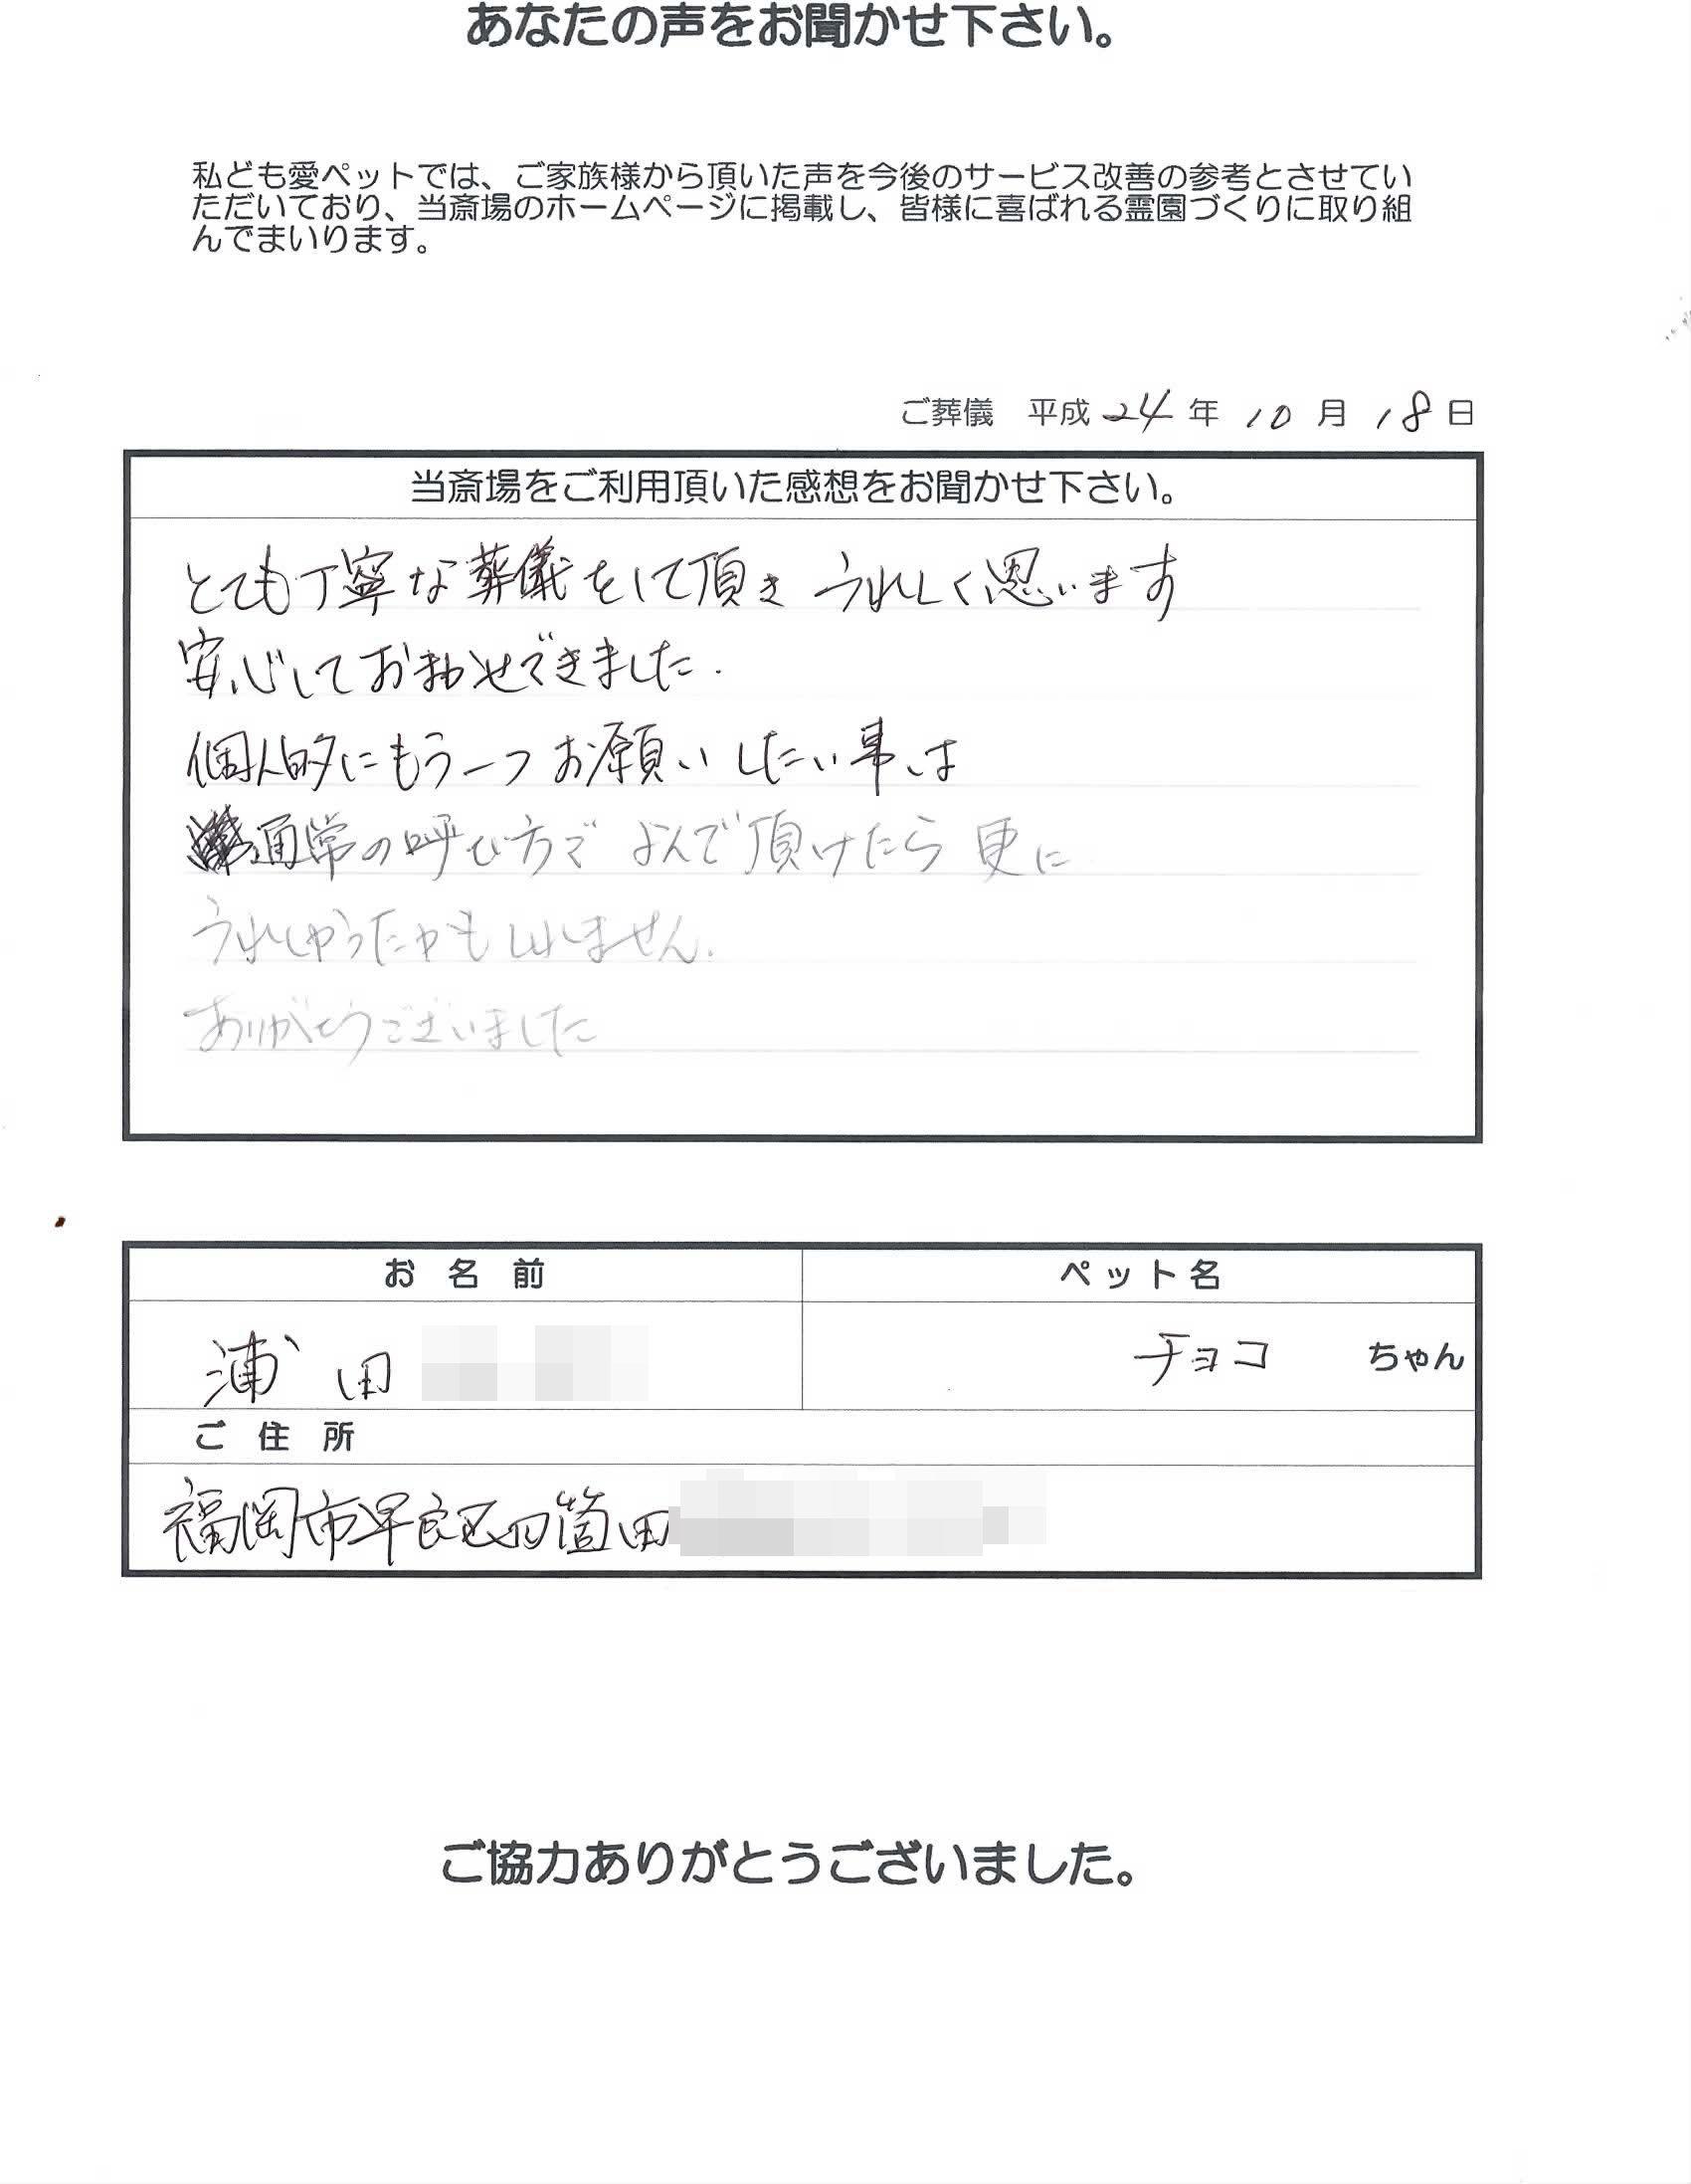 k121018-2.jpg